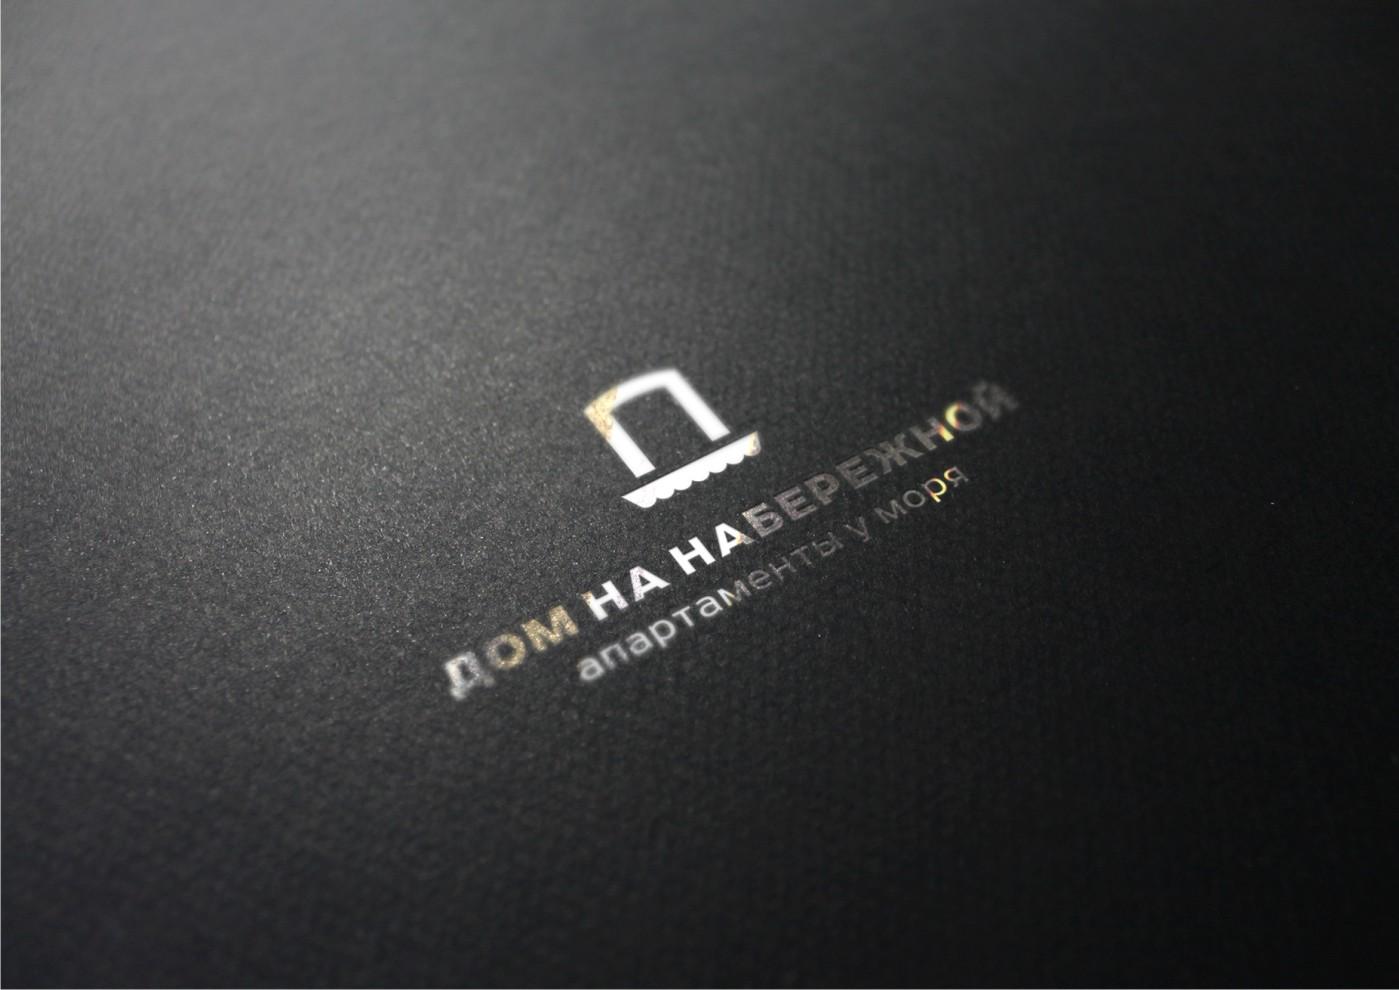 РАЗРАБОТКА логотипа для ЖИЛОГО КОМПЛЕКСА премиум В АНАПЕ.  фото f_6935de77a5bcc0a8.jpg